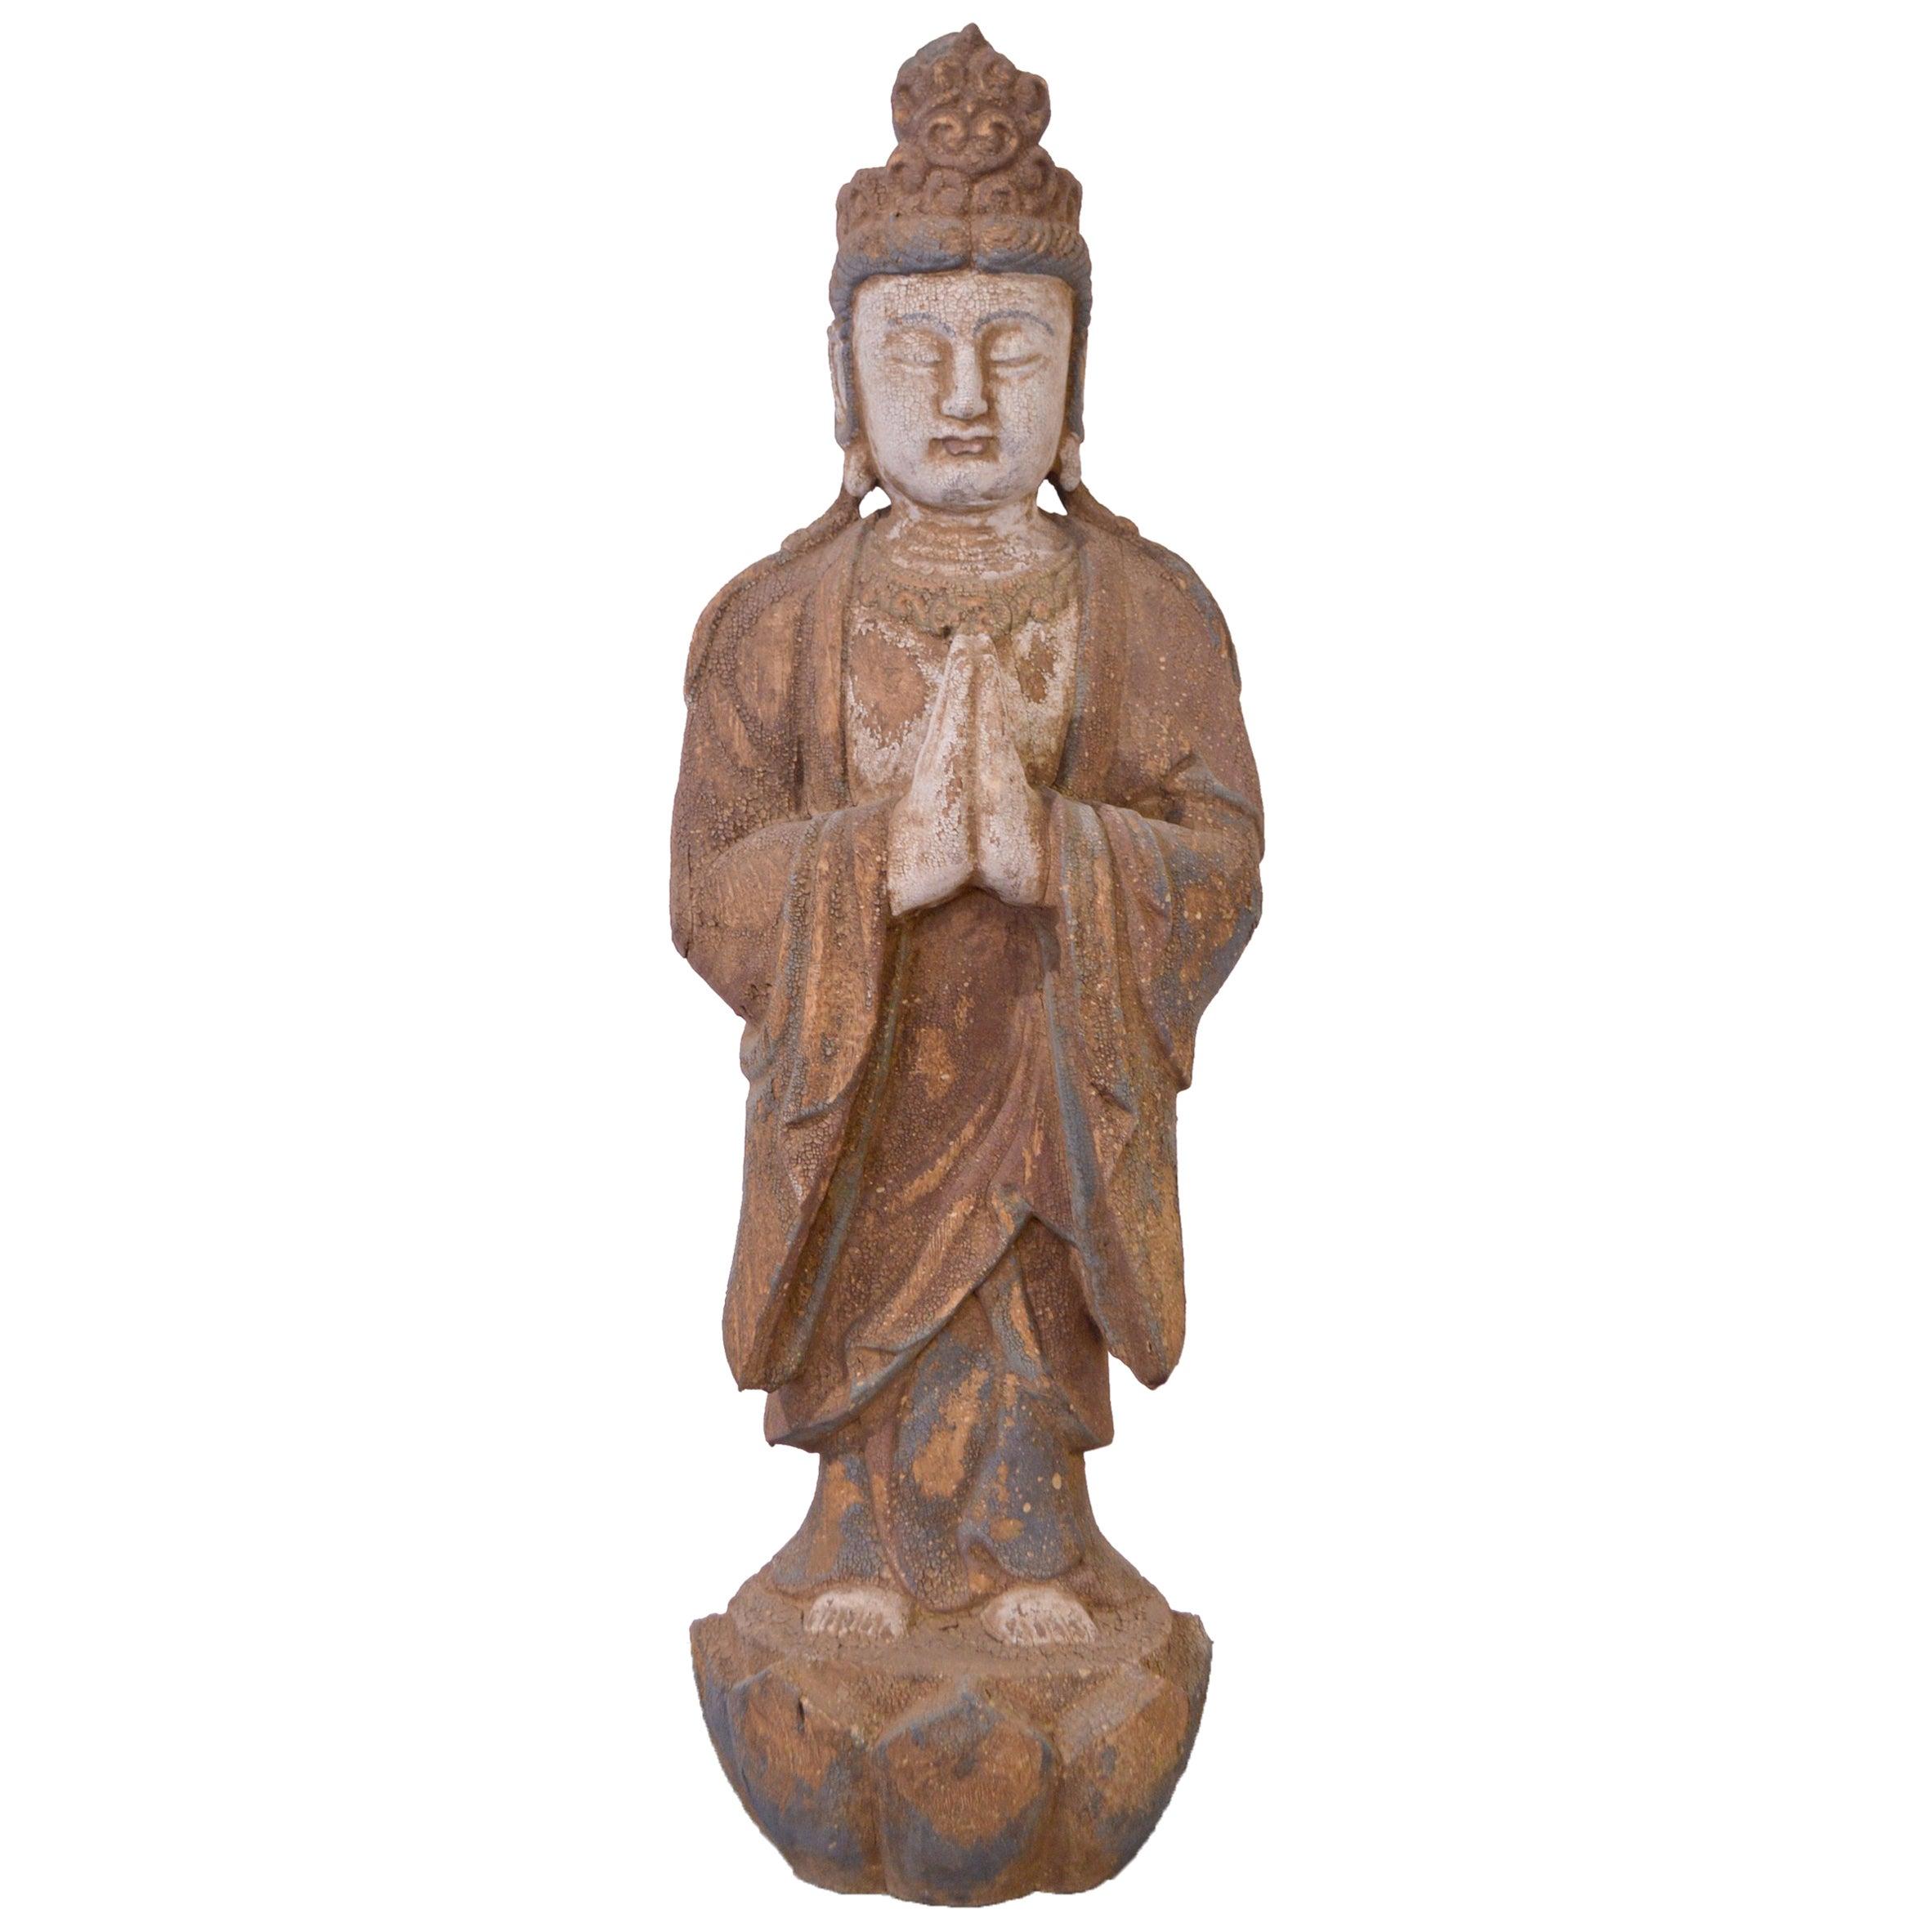 20th Century Hand-Carved Wood Buddha